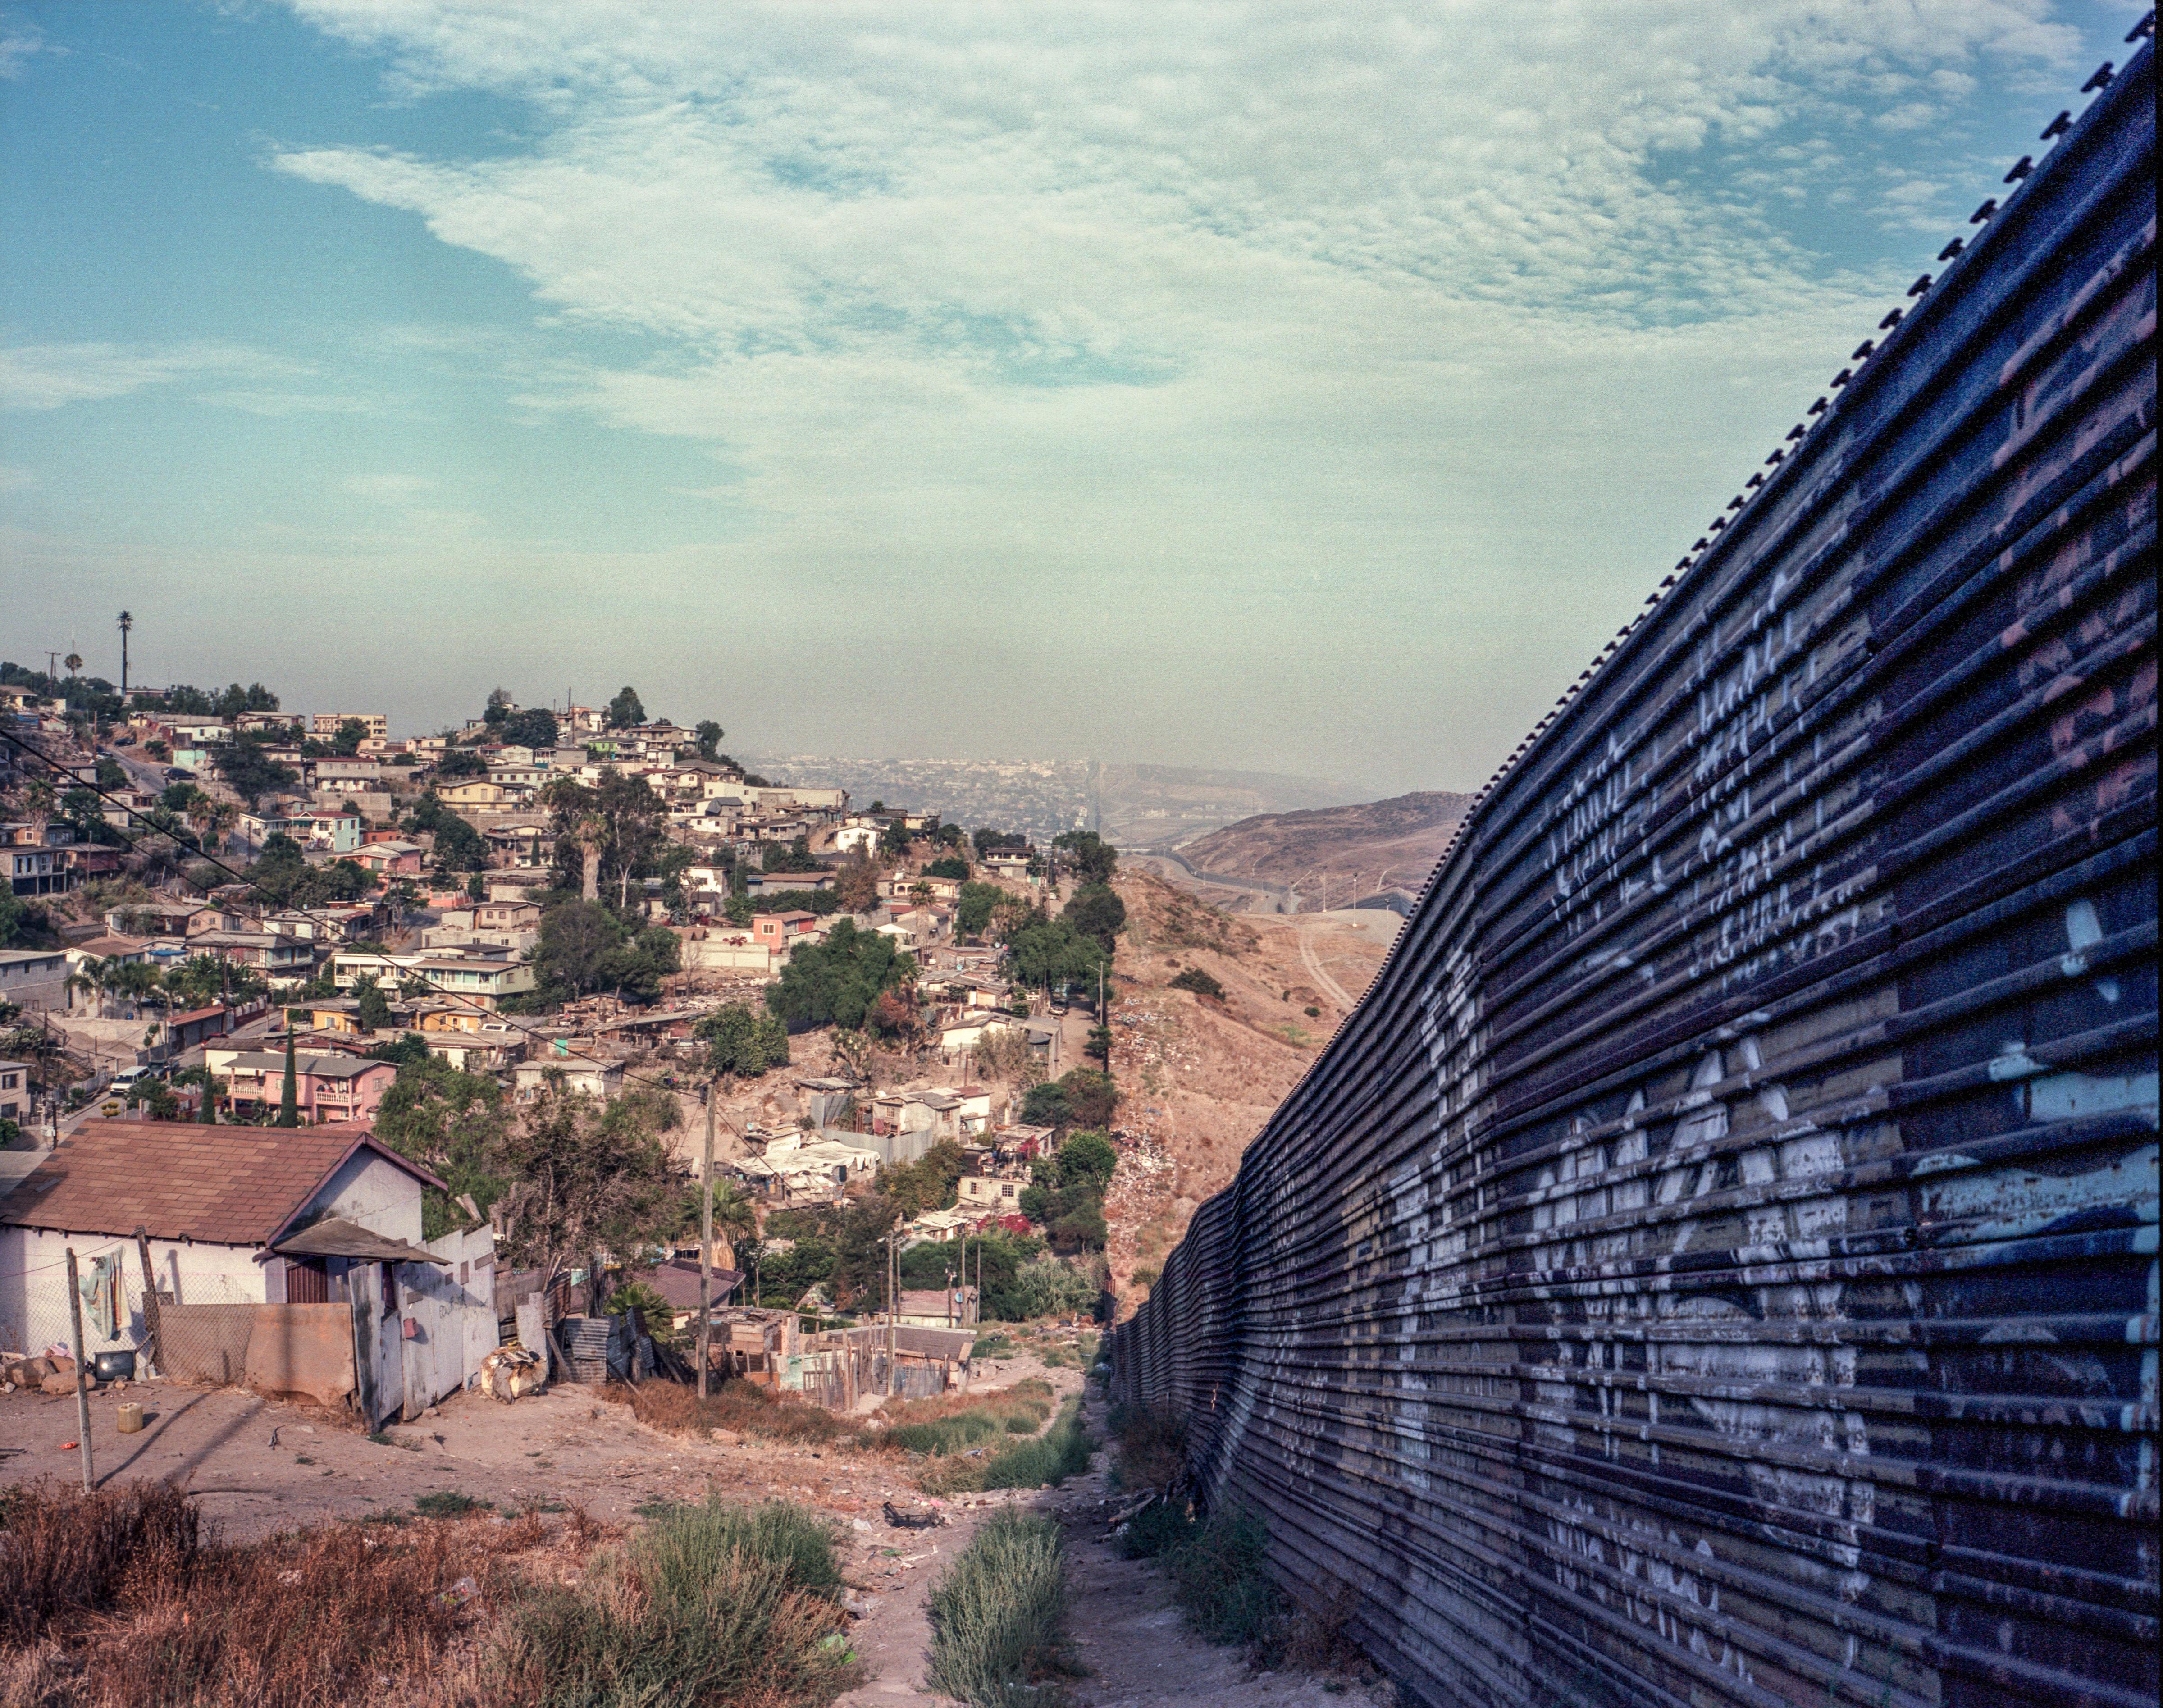 U S Mexico Border At Tijuana And San Ysidro